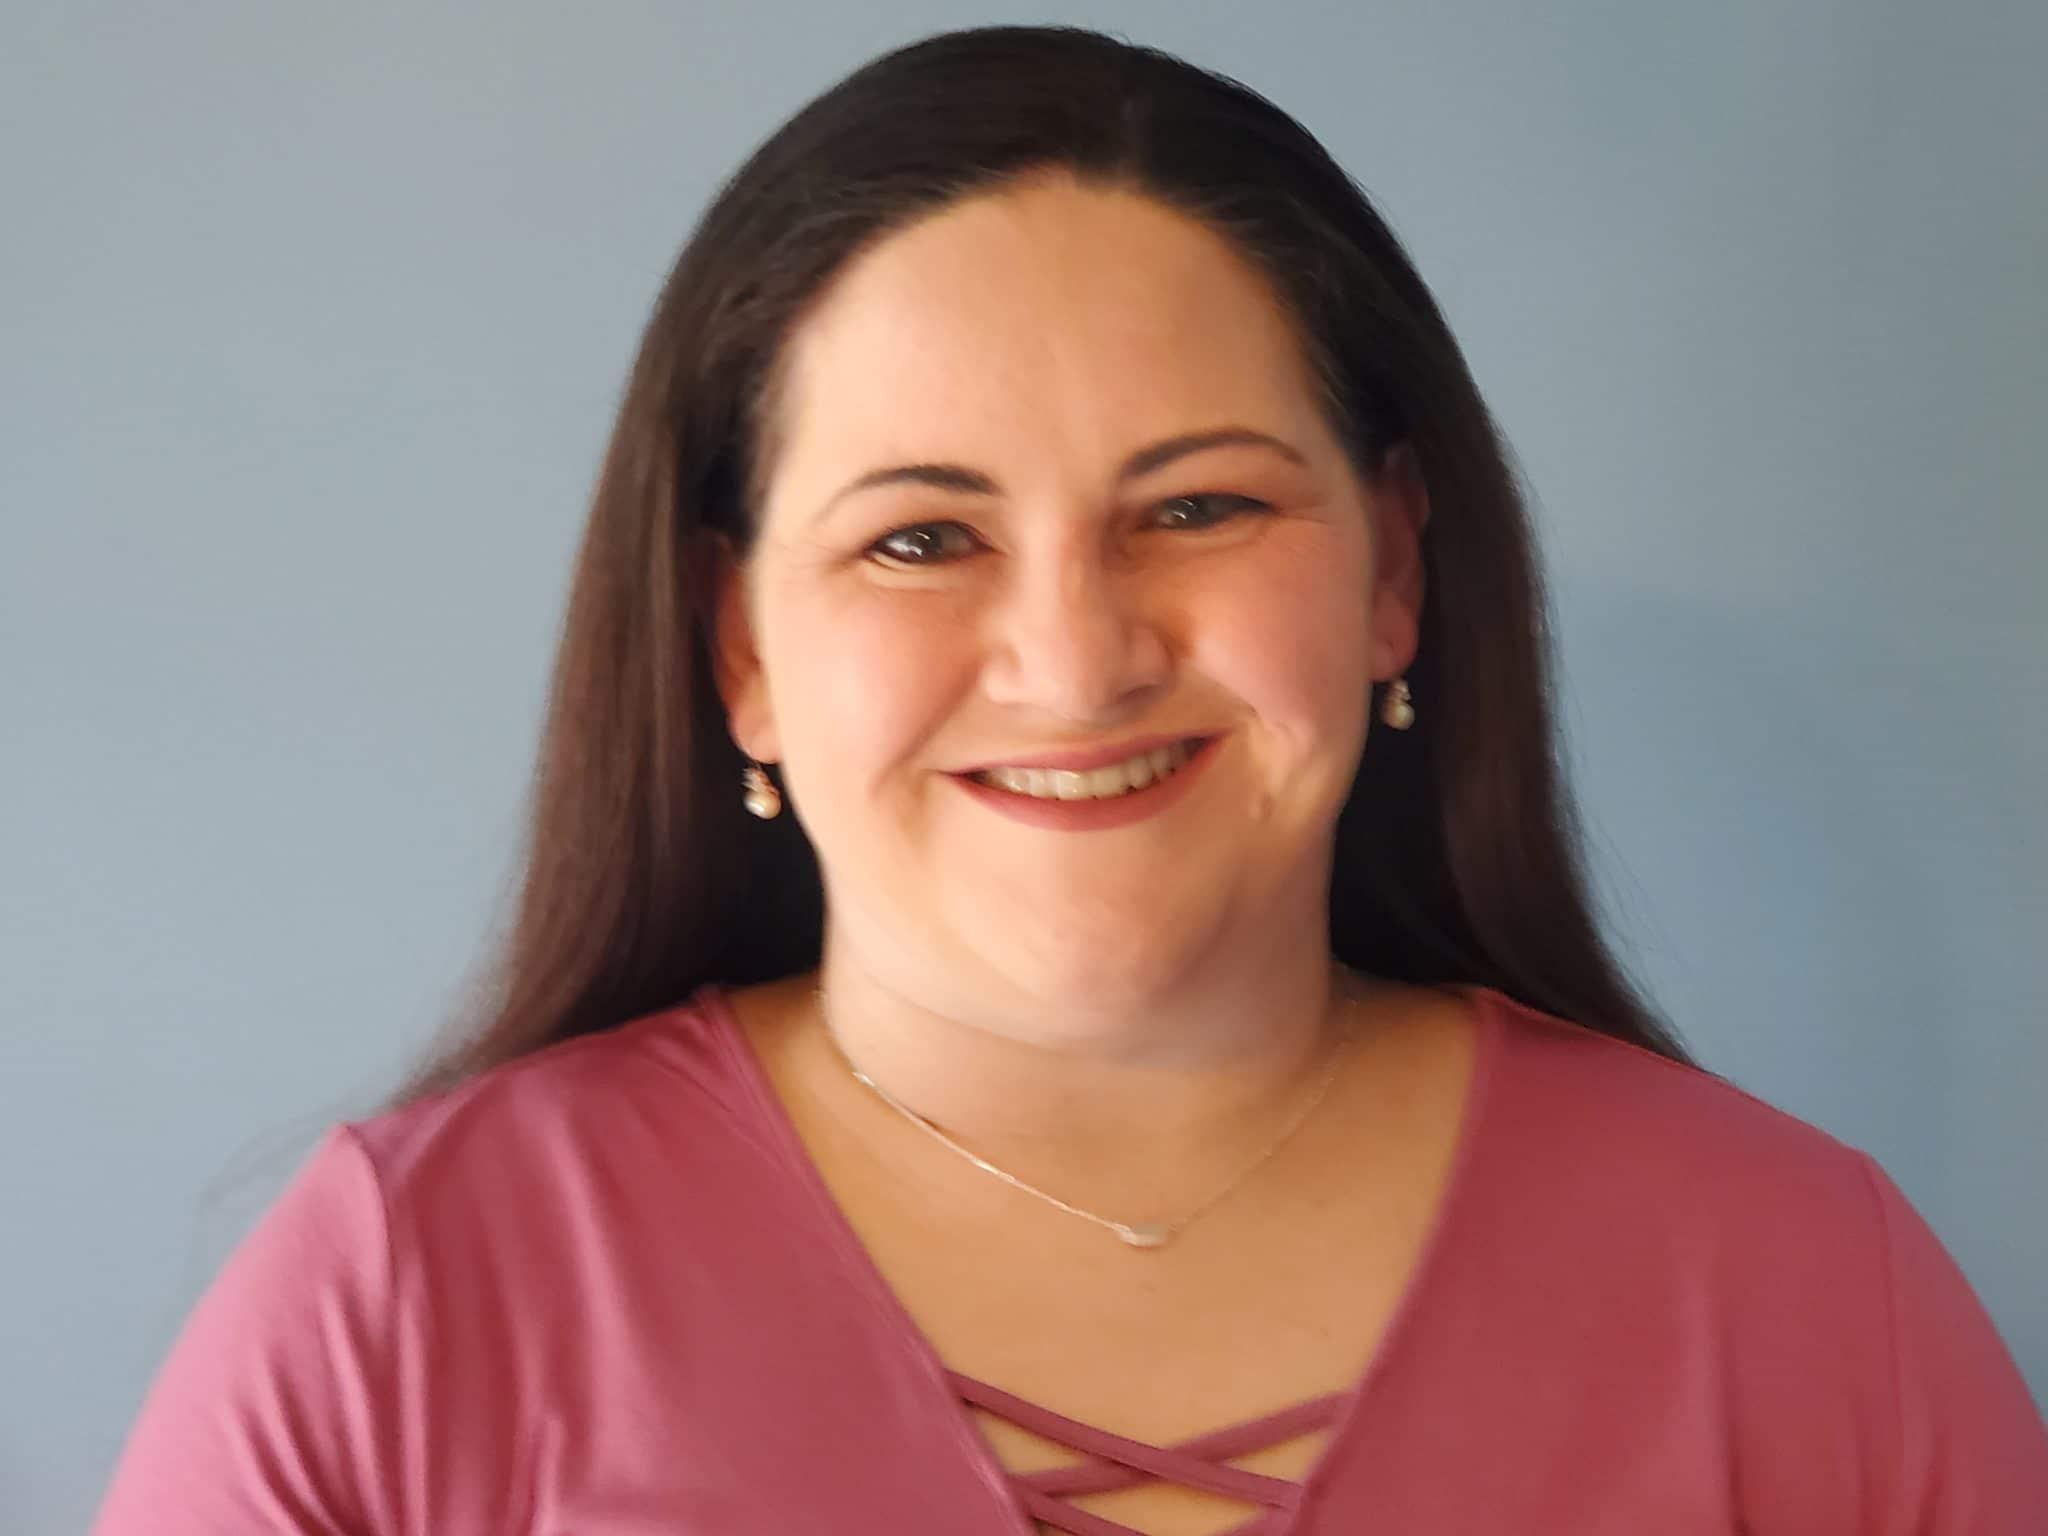 Vanessa Bullock